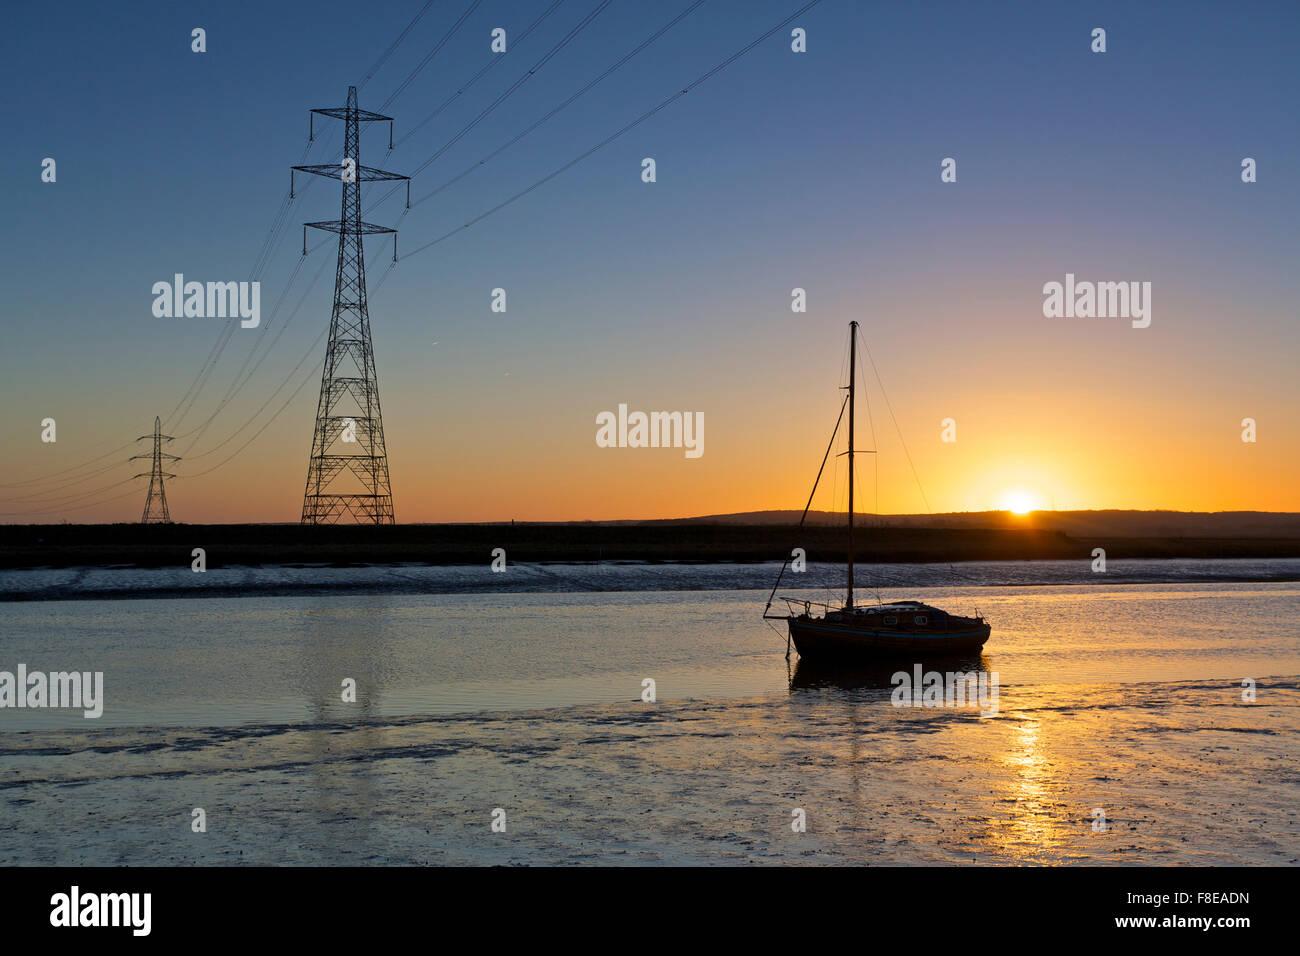 Faversham Creek, Kent, UK. 9th December 2015: UK Weather. Clear Skies at sunrise on a cool morning after November - Stock Image